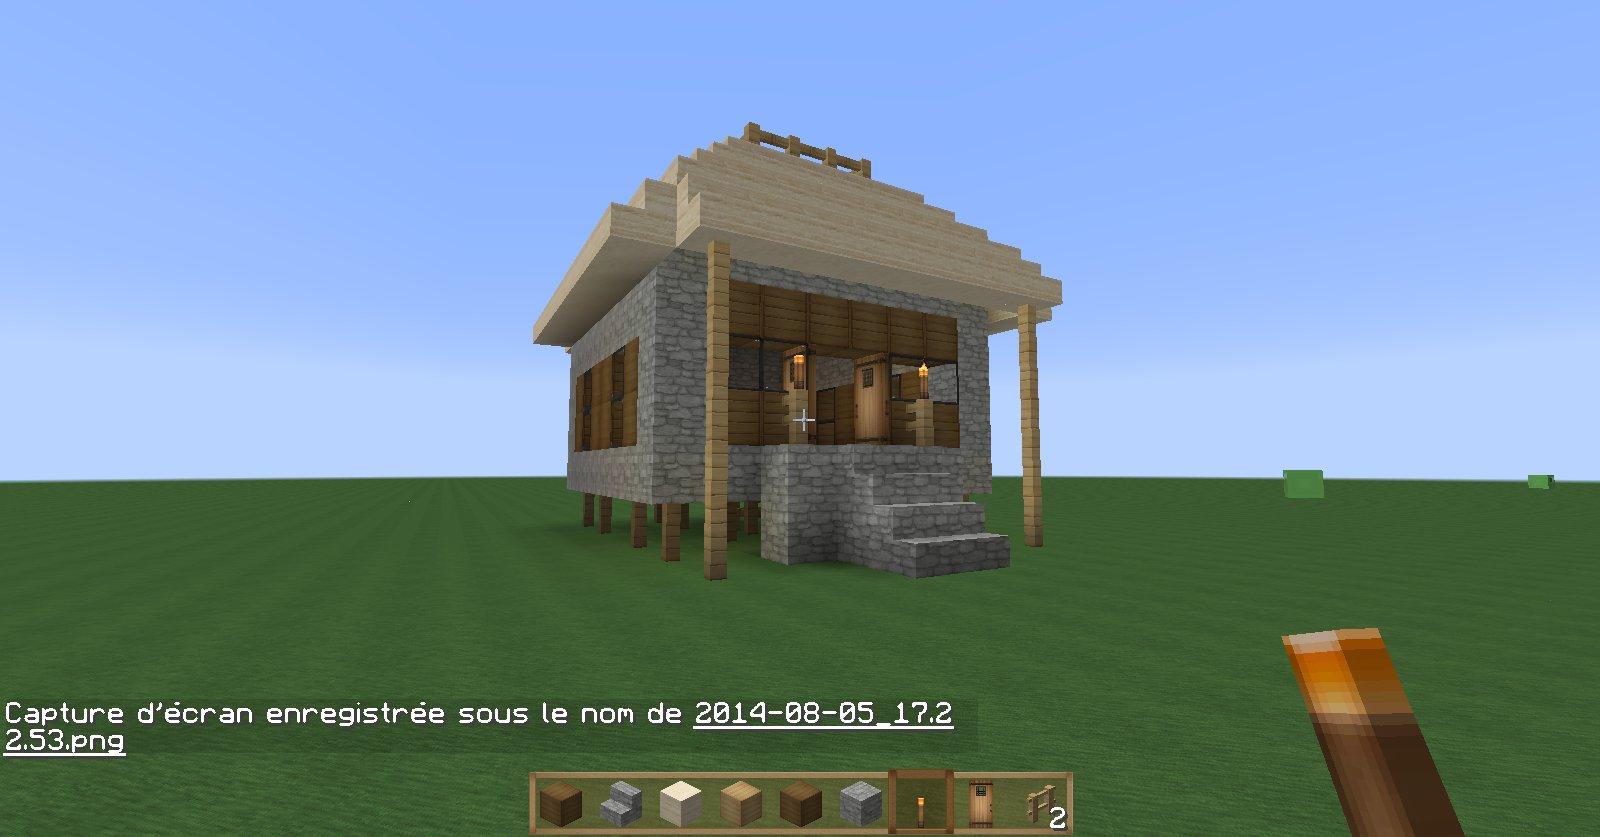 Projet village asiatique. E2ffdabb-47d2-4635-97eb-70caae23f448